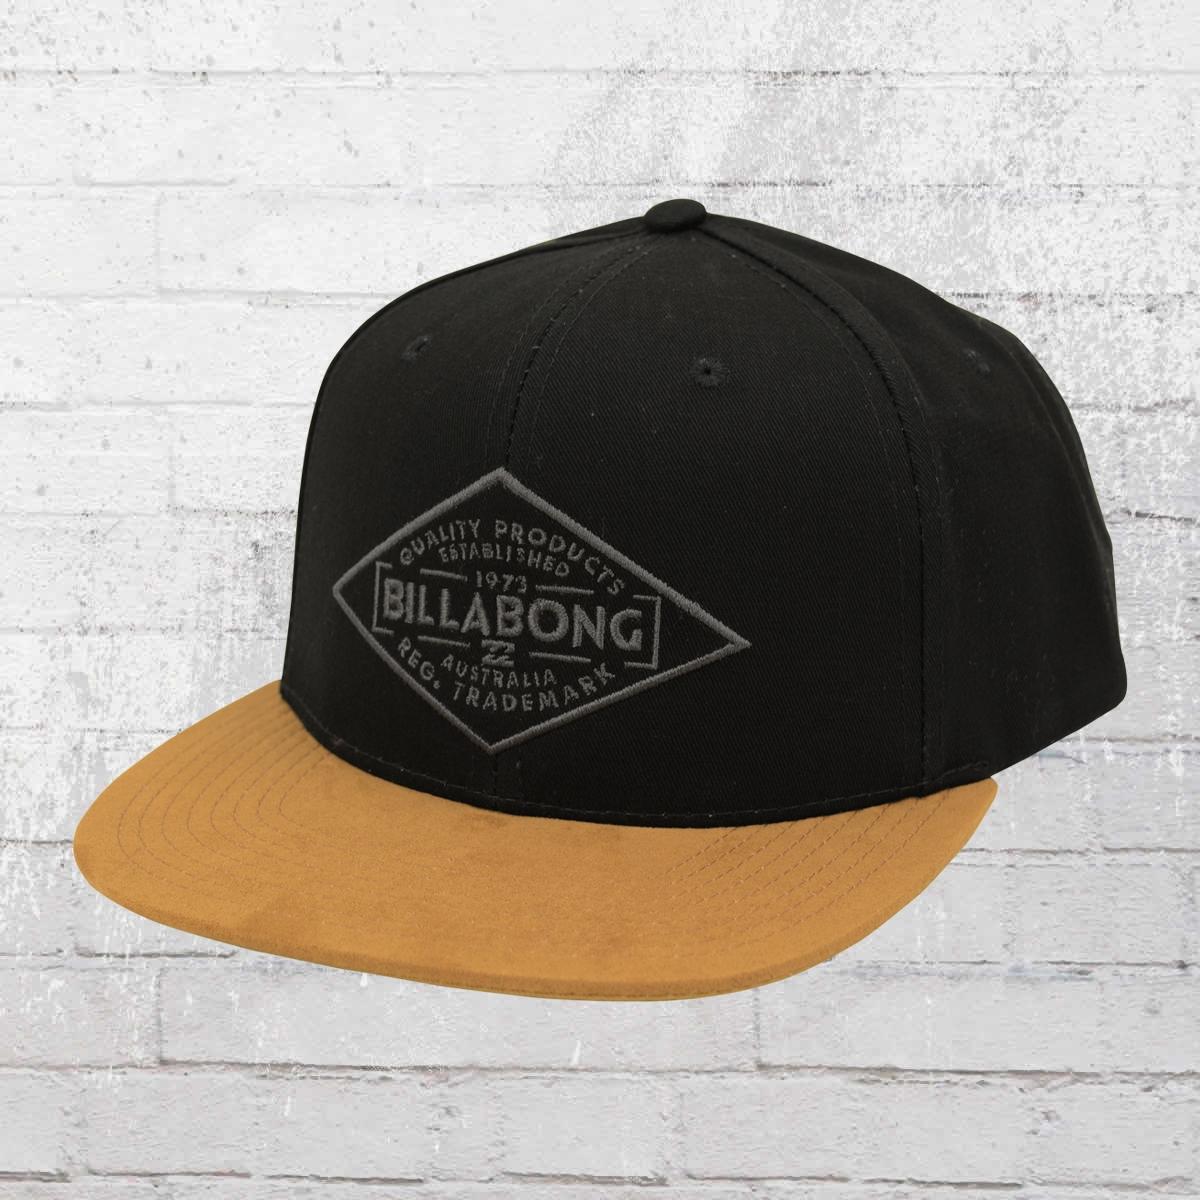 Billabong Cap Sama Snapback Kappe schwarz braun